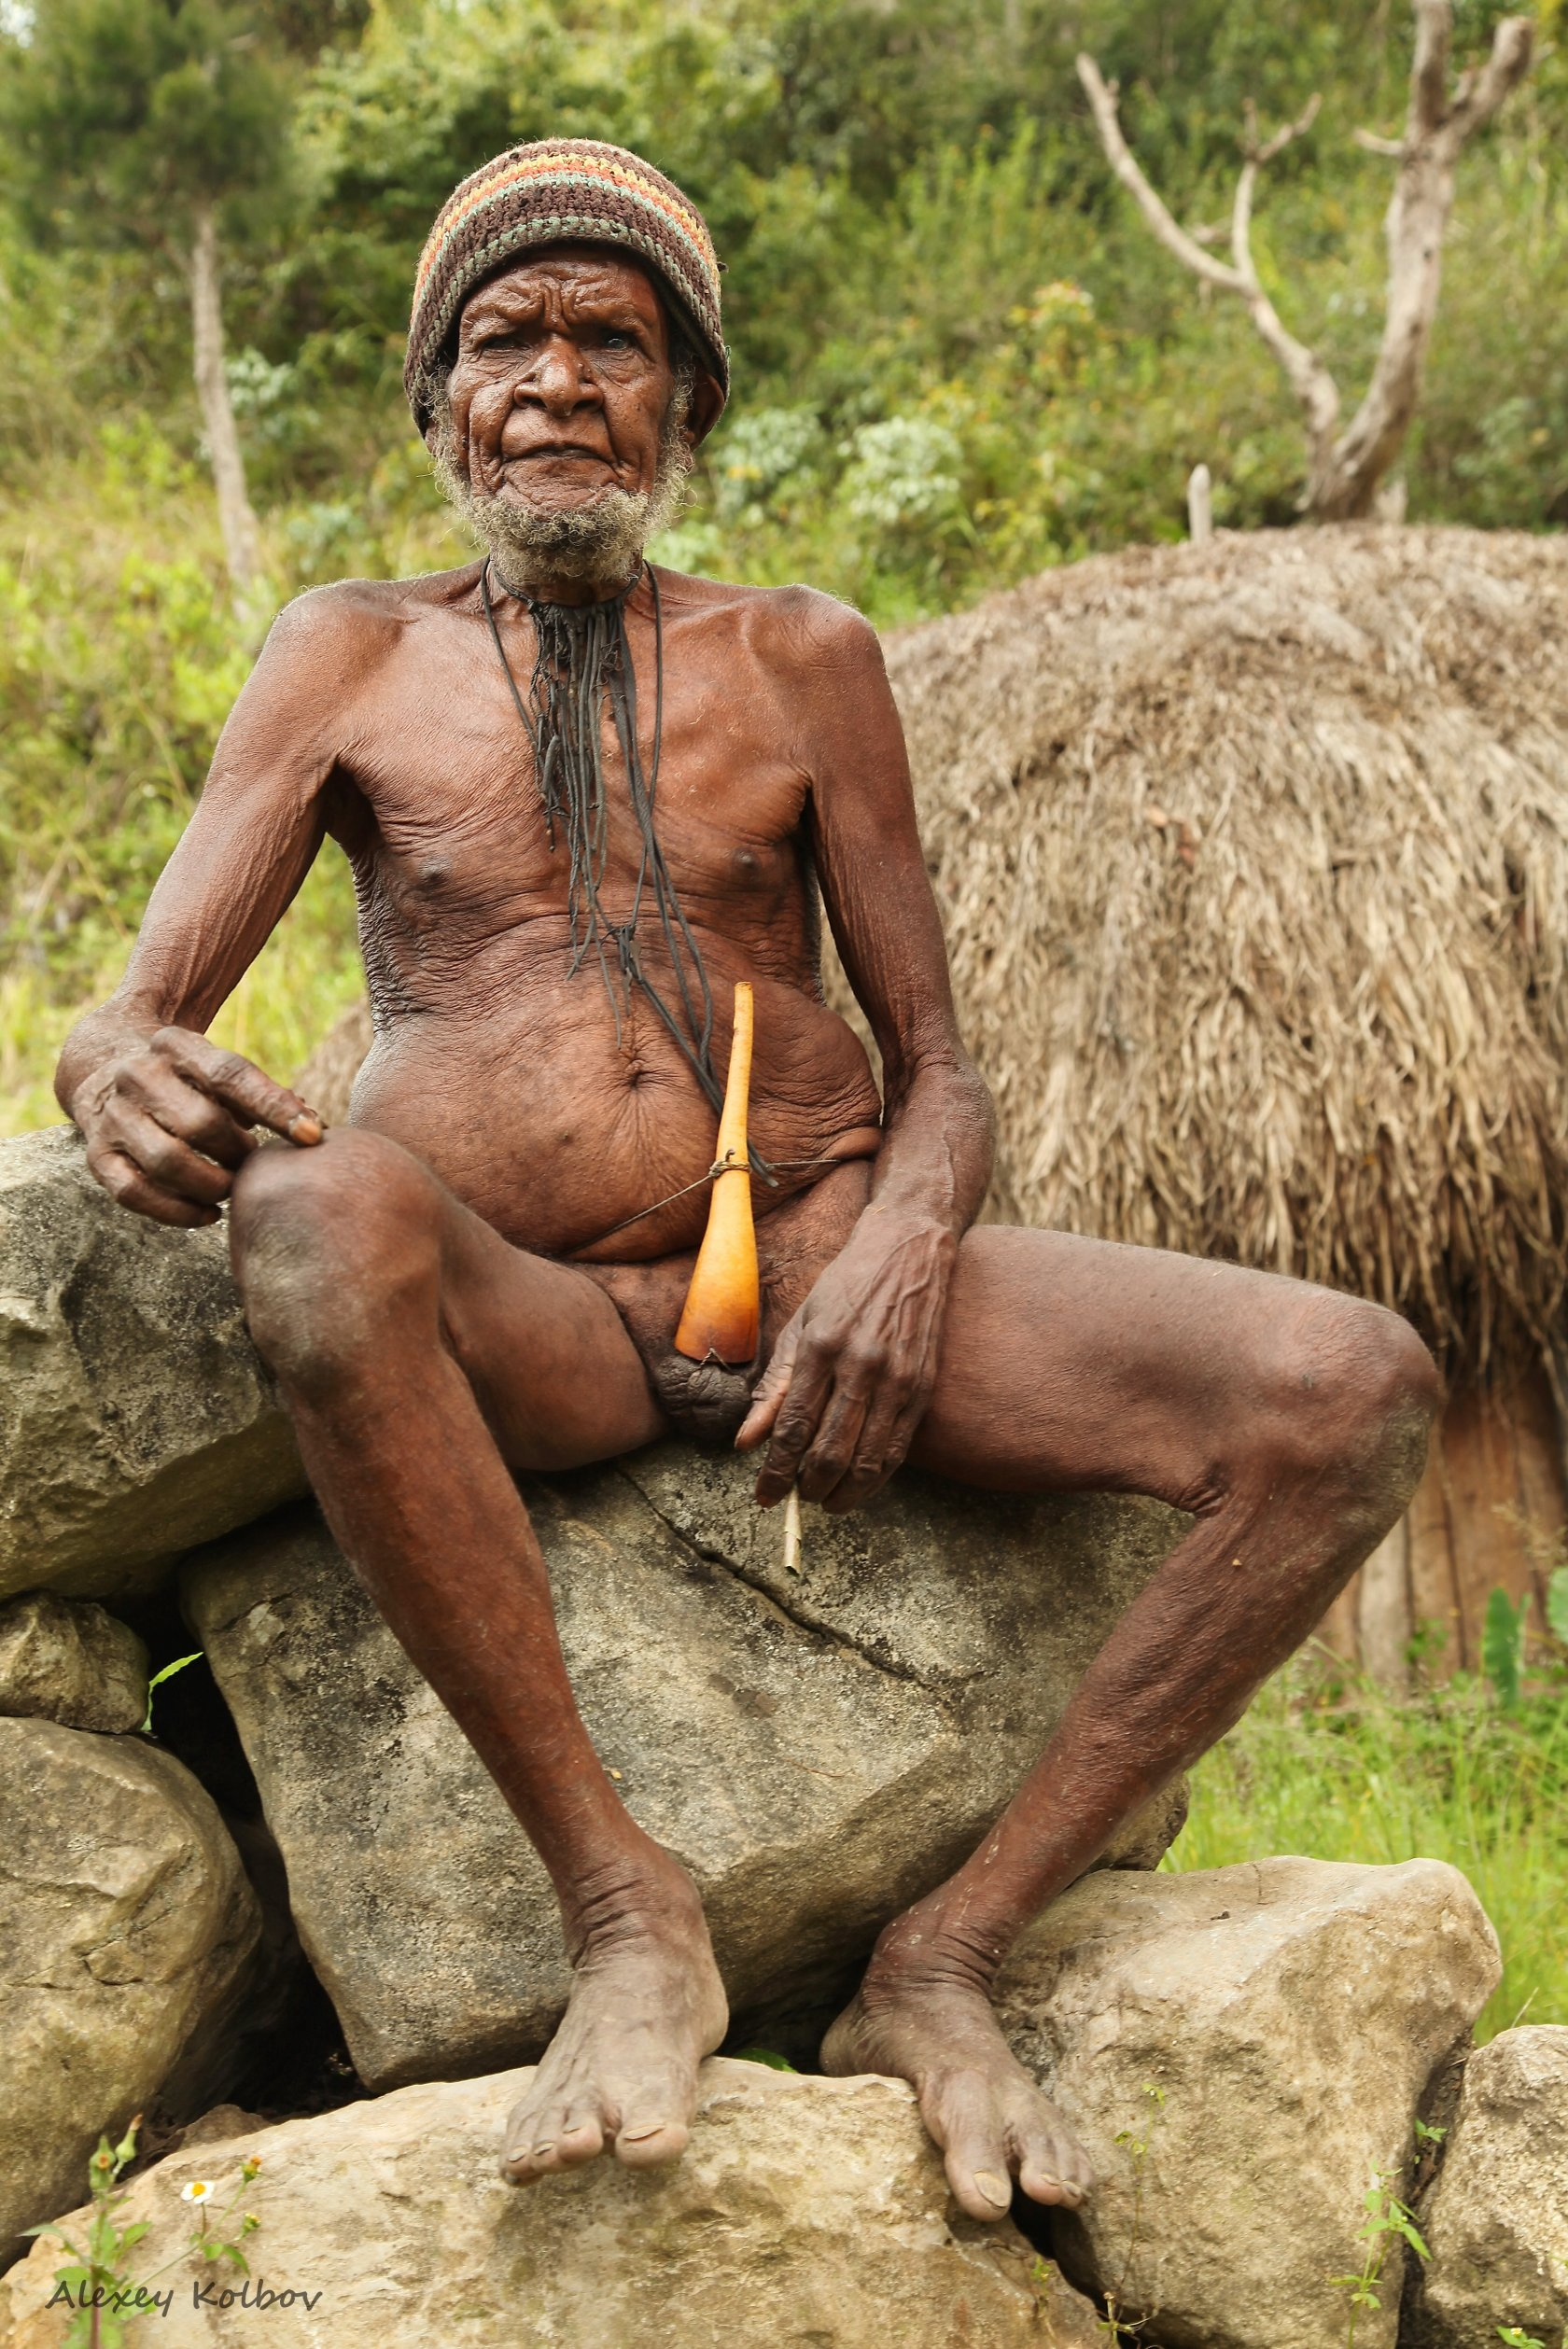 Travels in papua in dani tribal lands, papua, indonesia ramdas iyer photography